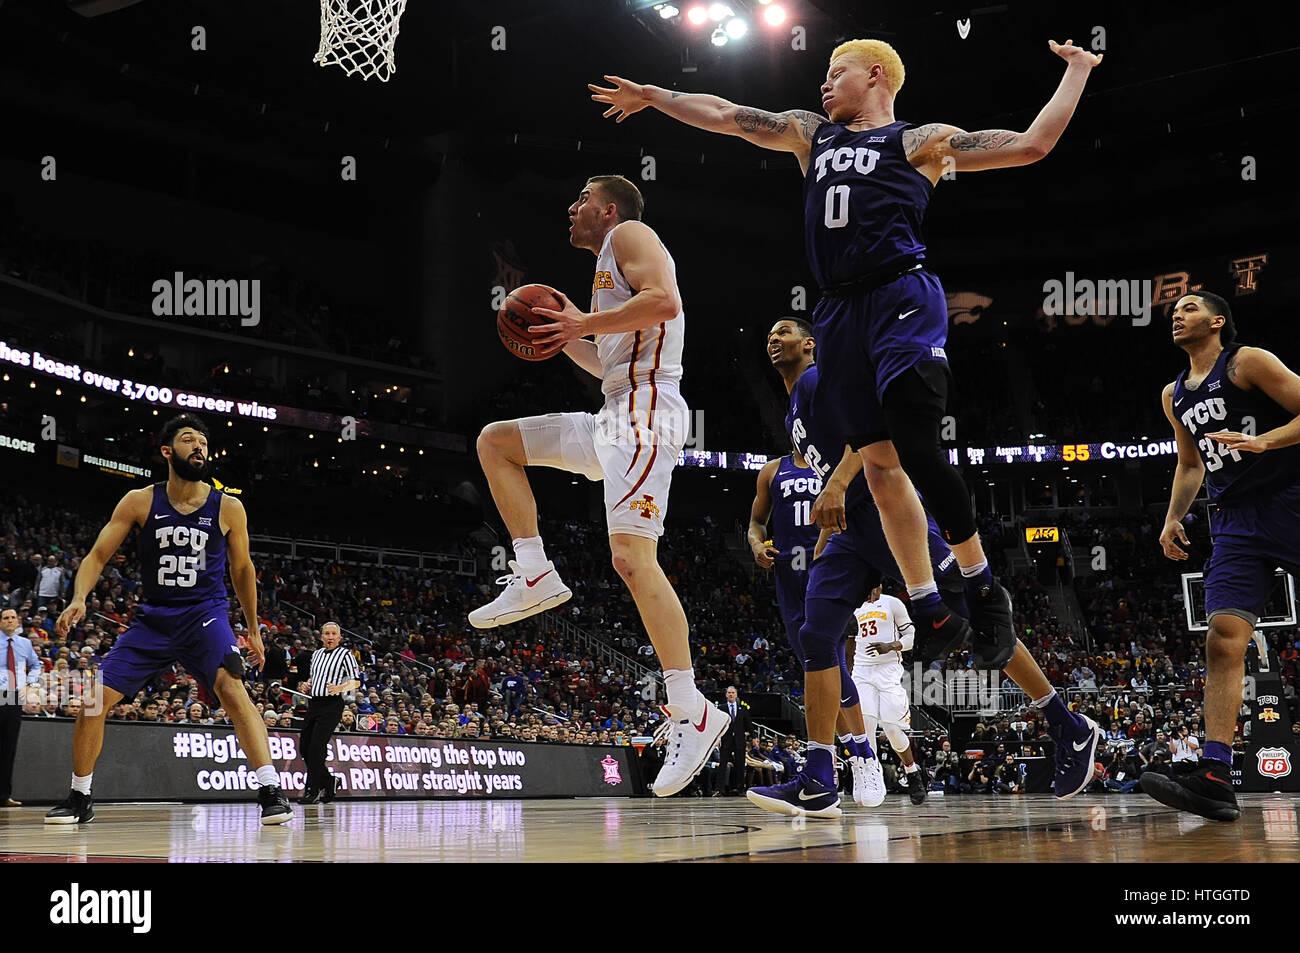 Kansas City, Missouri, USA. 10th Mar, 2017. Iowa State Cyclones guard Matt Thomas (21) drives to the basket past - Stock Image